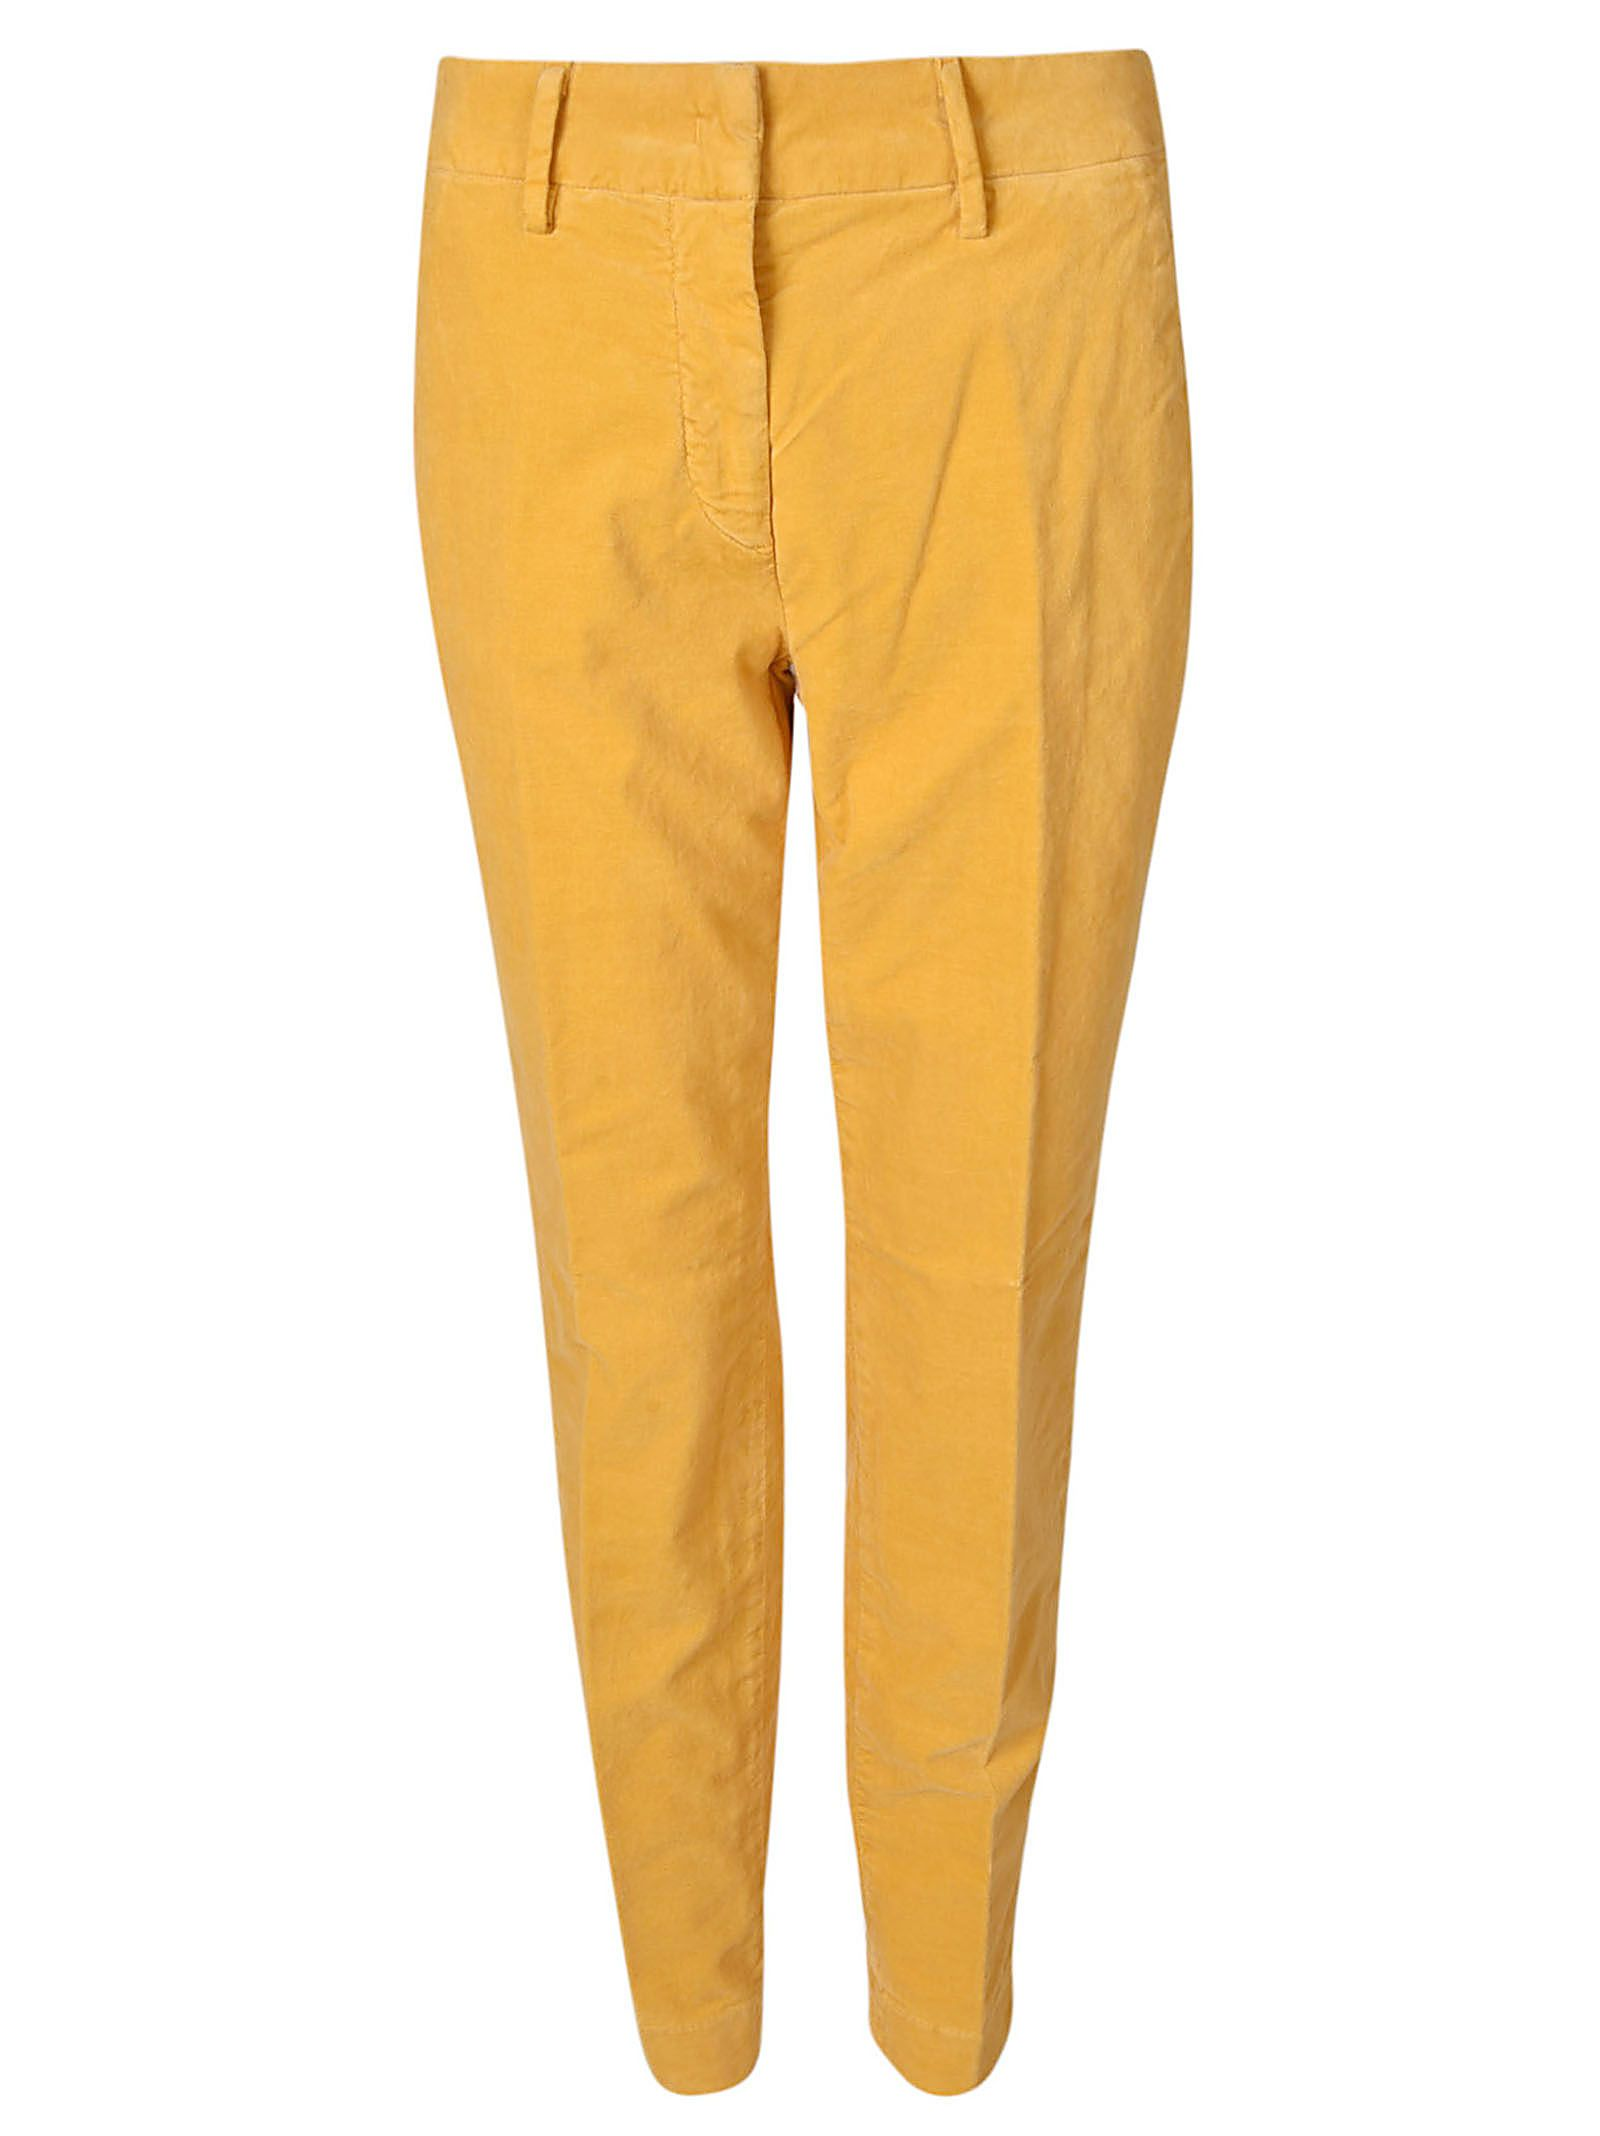 MASON'S Chino Trousers in Yellow